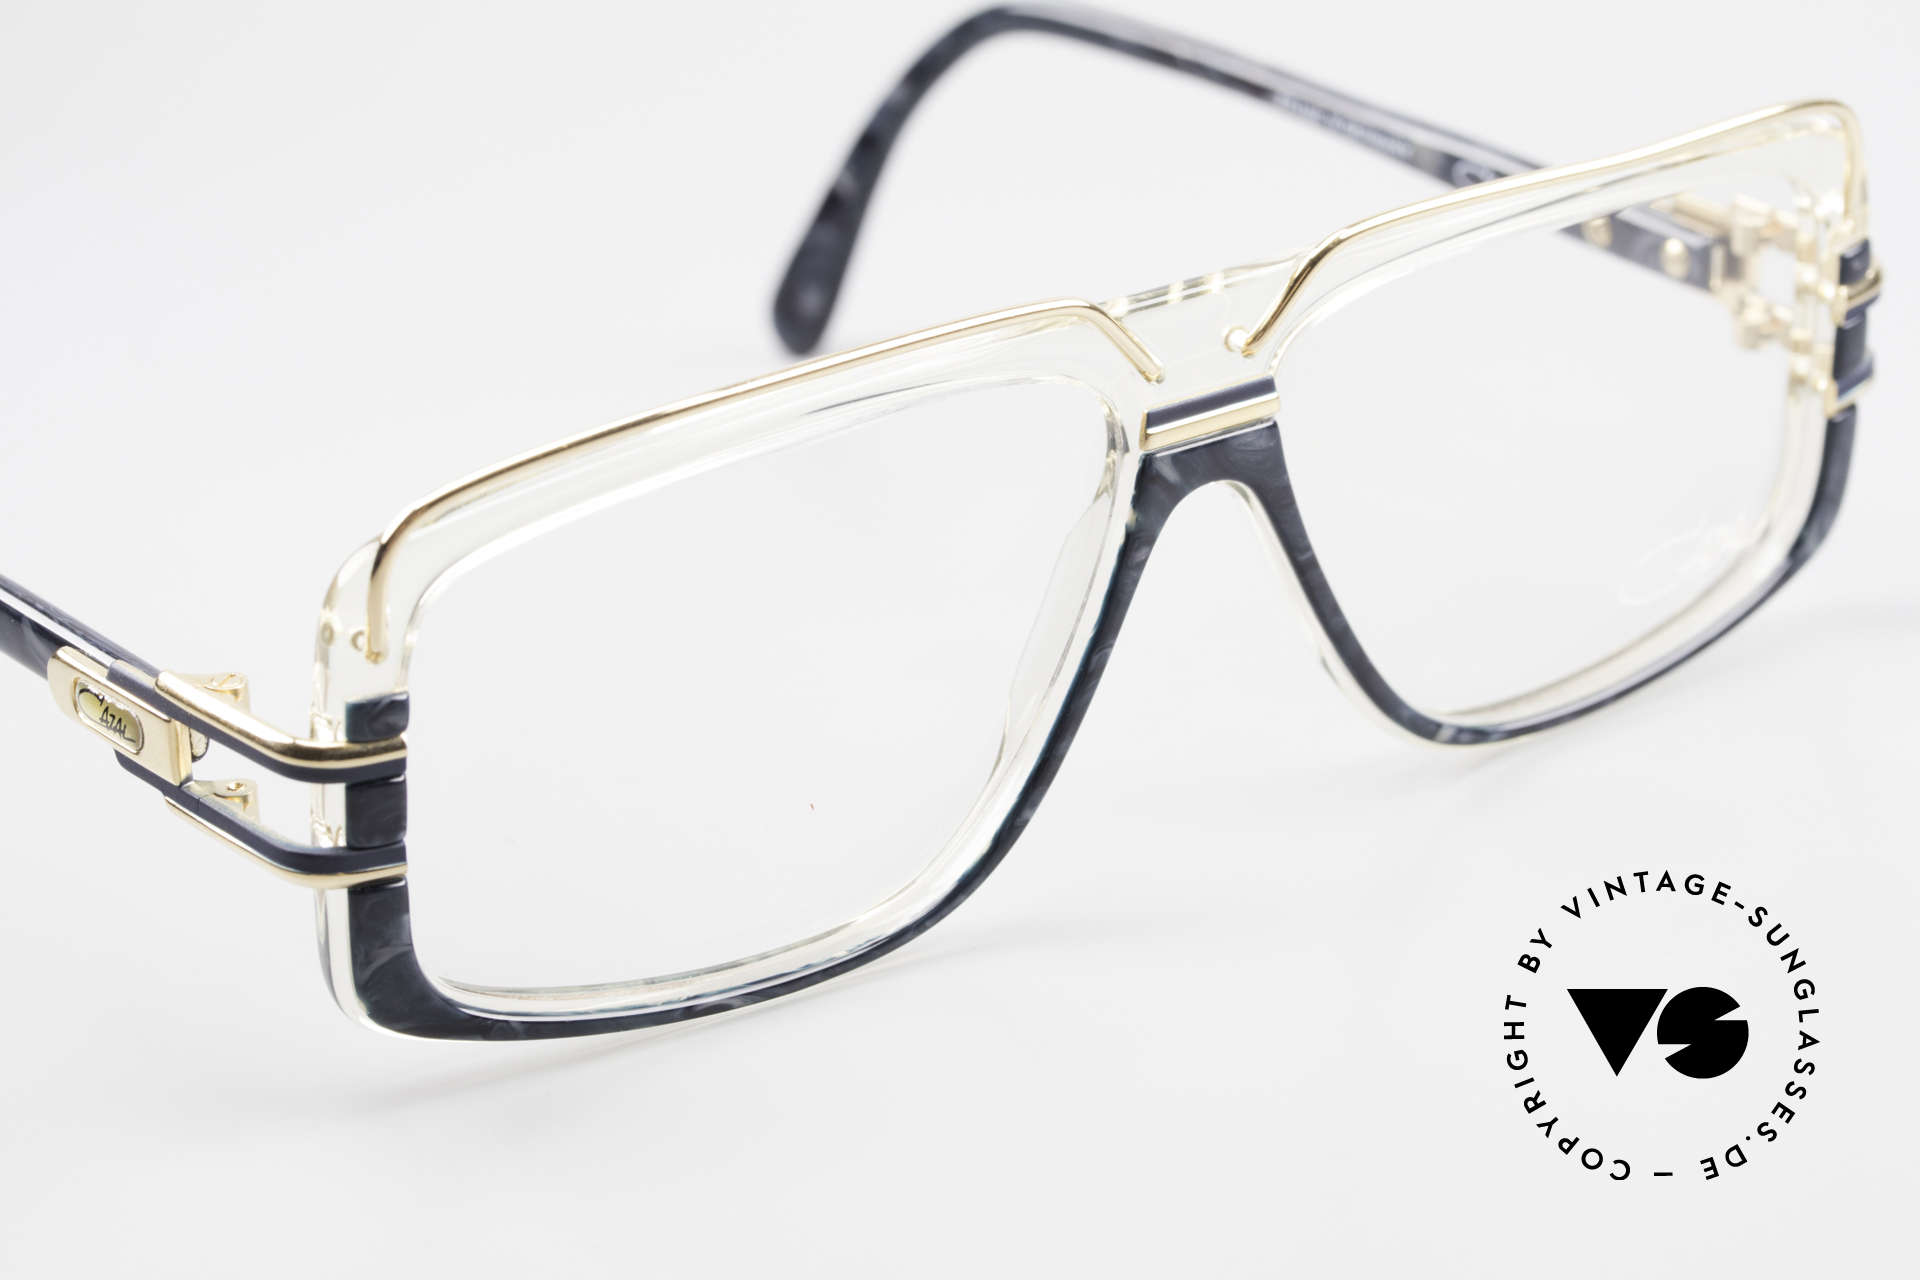 Cazal 640 80's Hip Hop Eyeglass Frame, new old stock (like all our rare vintage Cazal specs), Made for Men